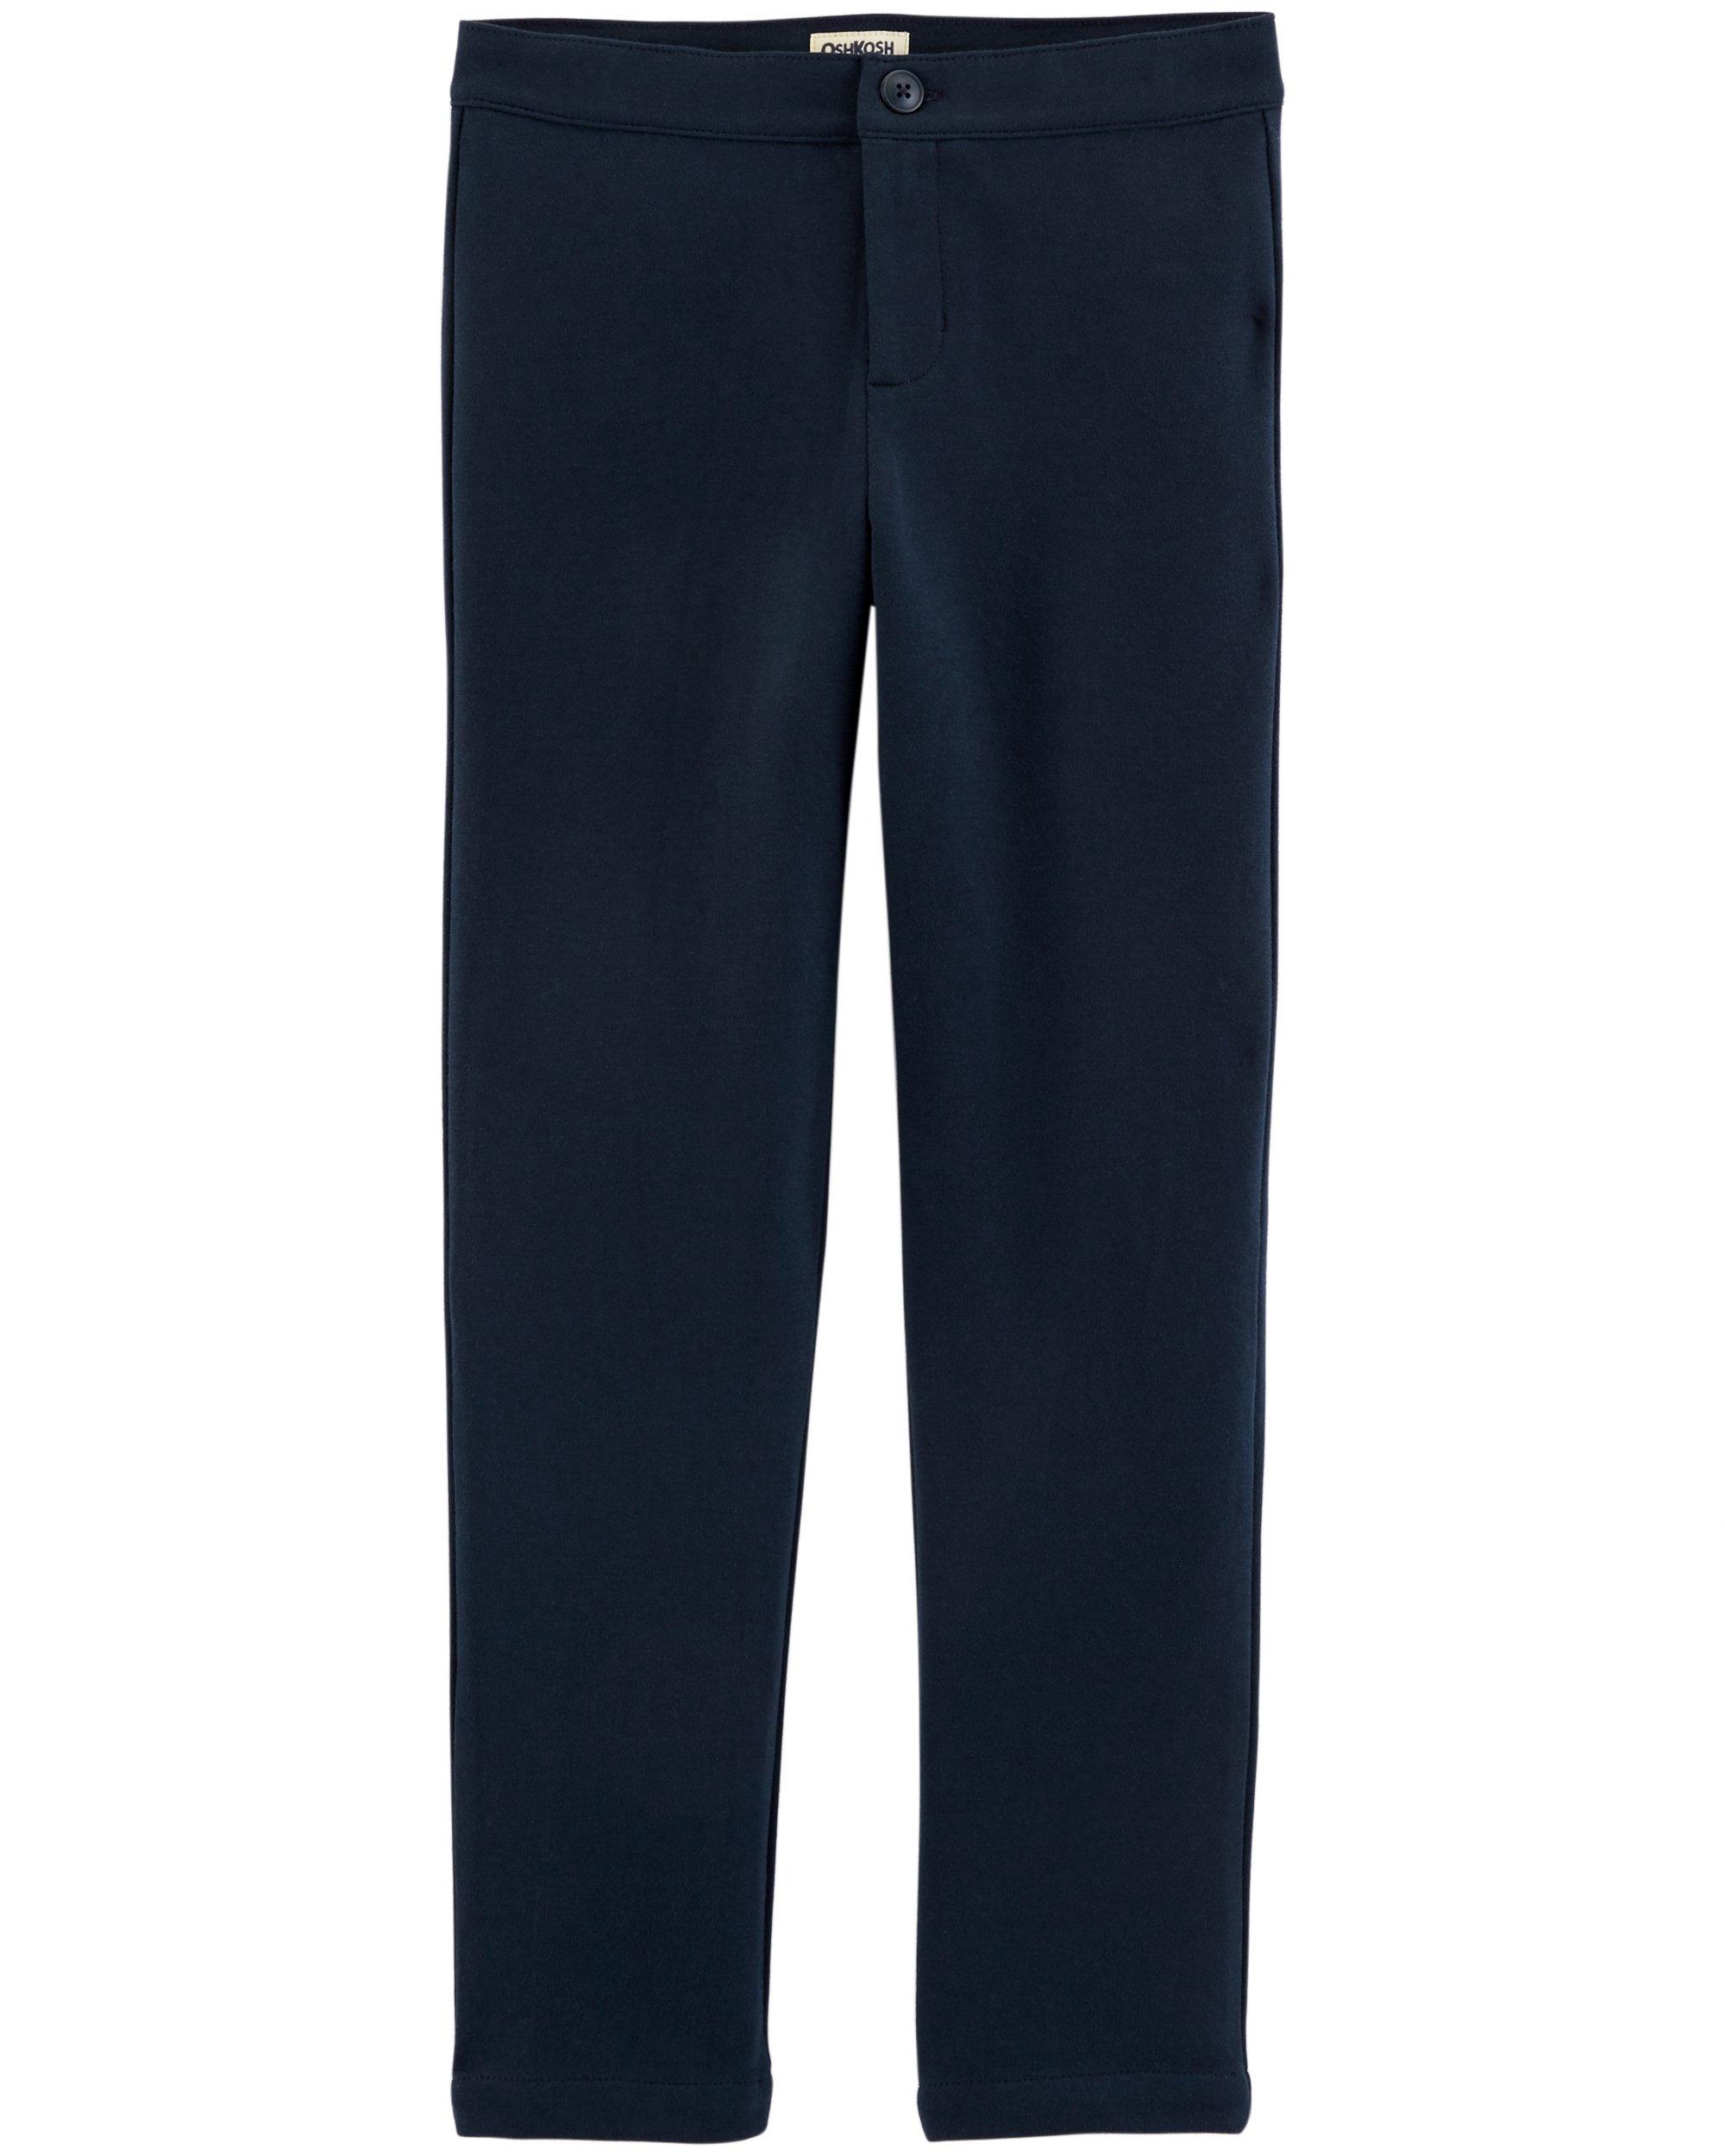 Osh Kosh Girls' Kids Uniform Ponte Pant, Navy, 14